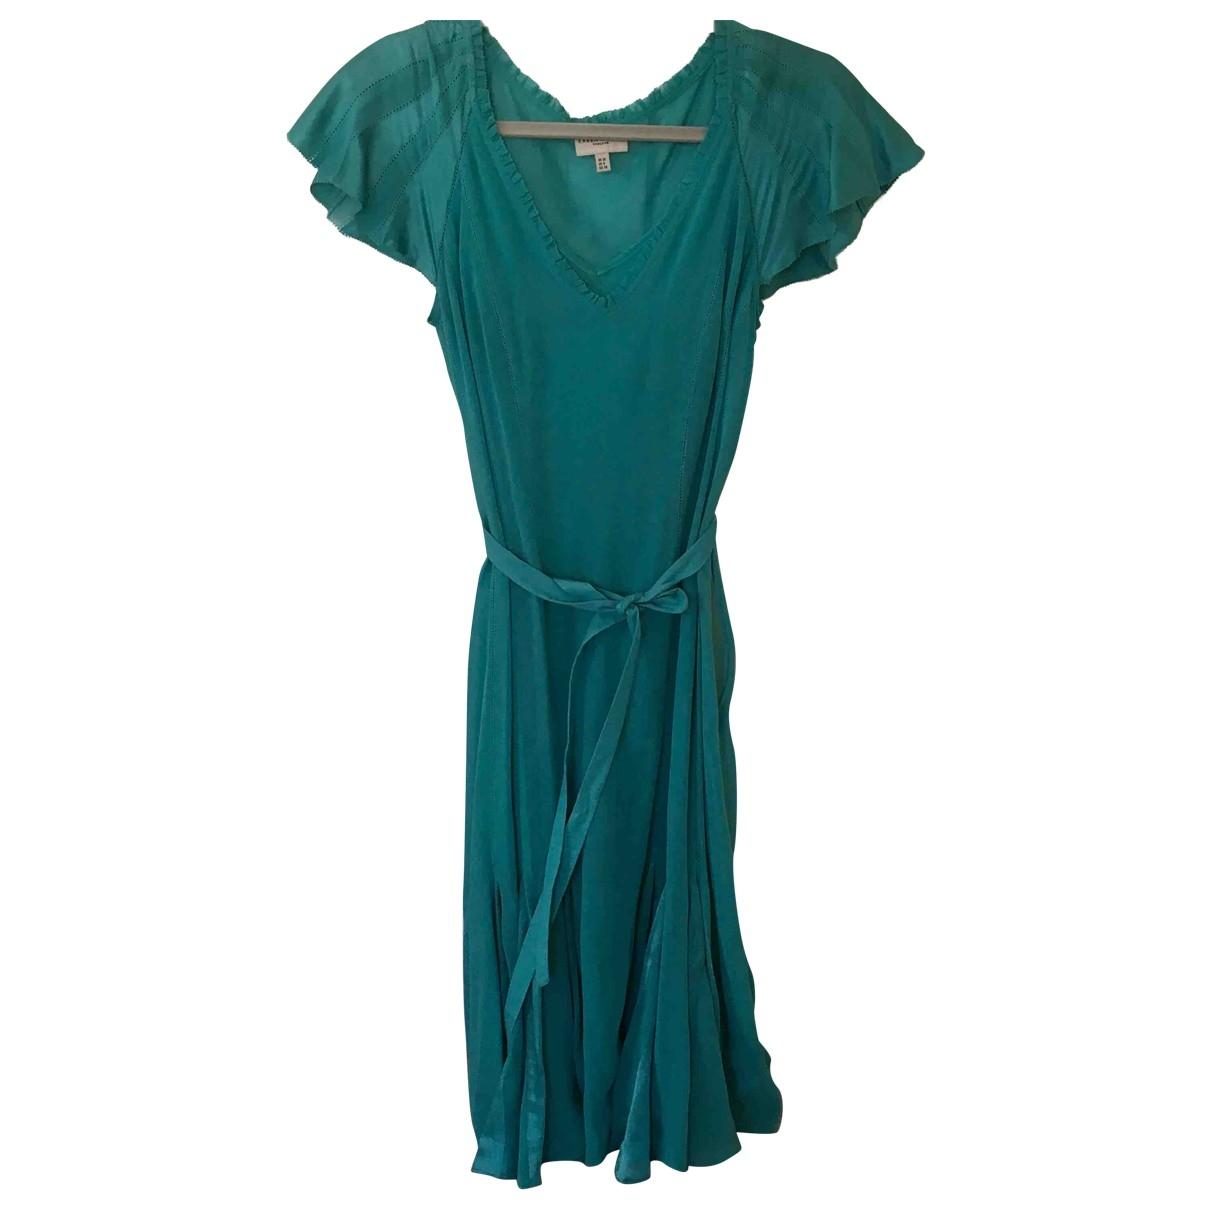 Karen Millen \N Turquoise Silk dress for Women 10 UK